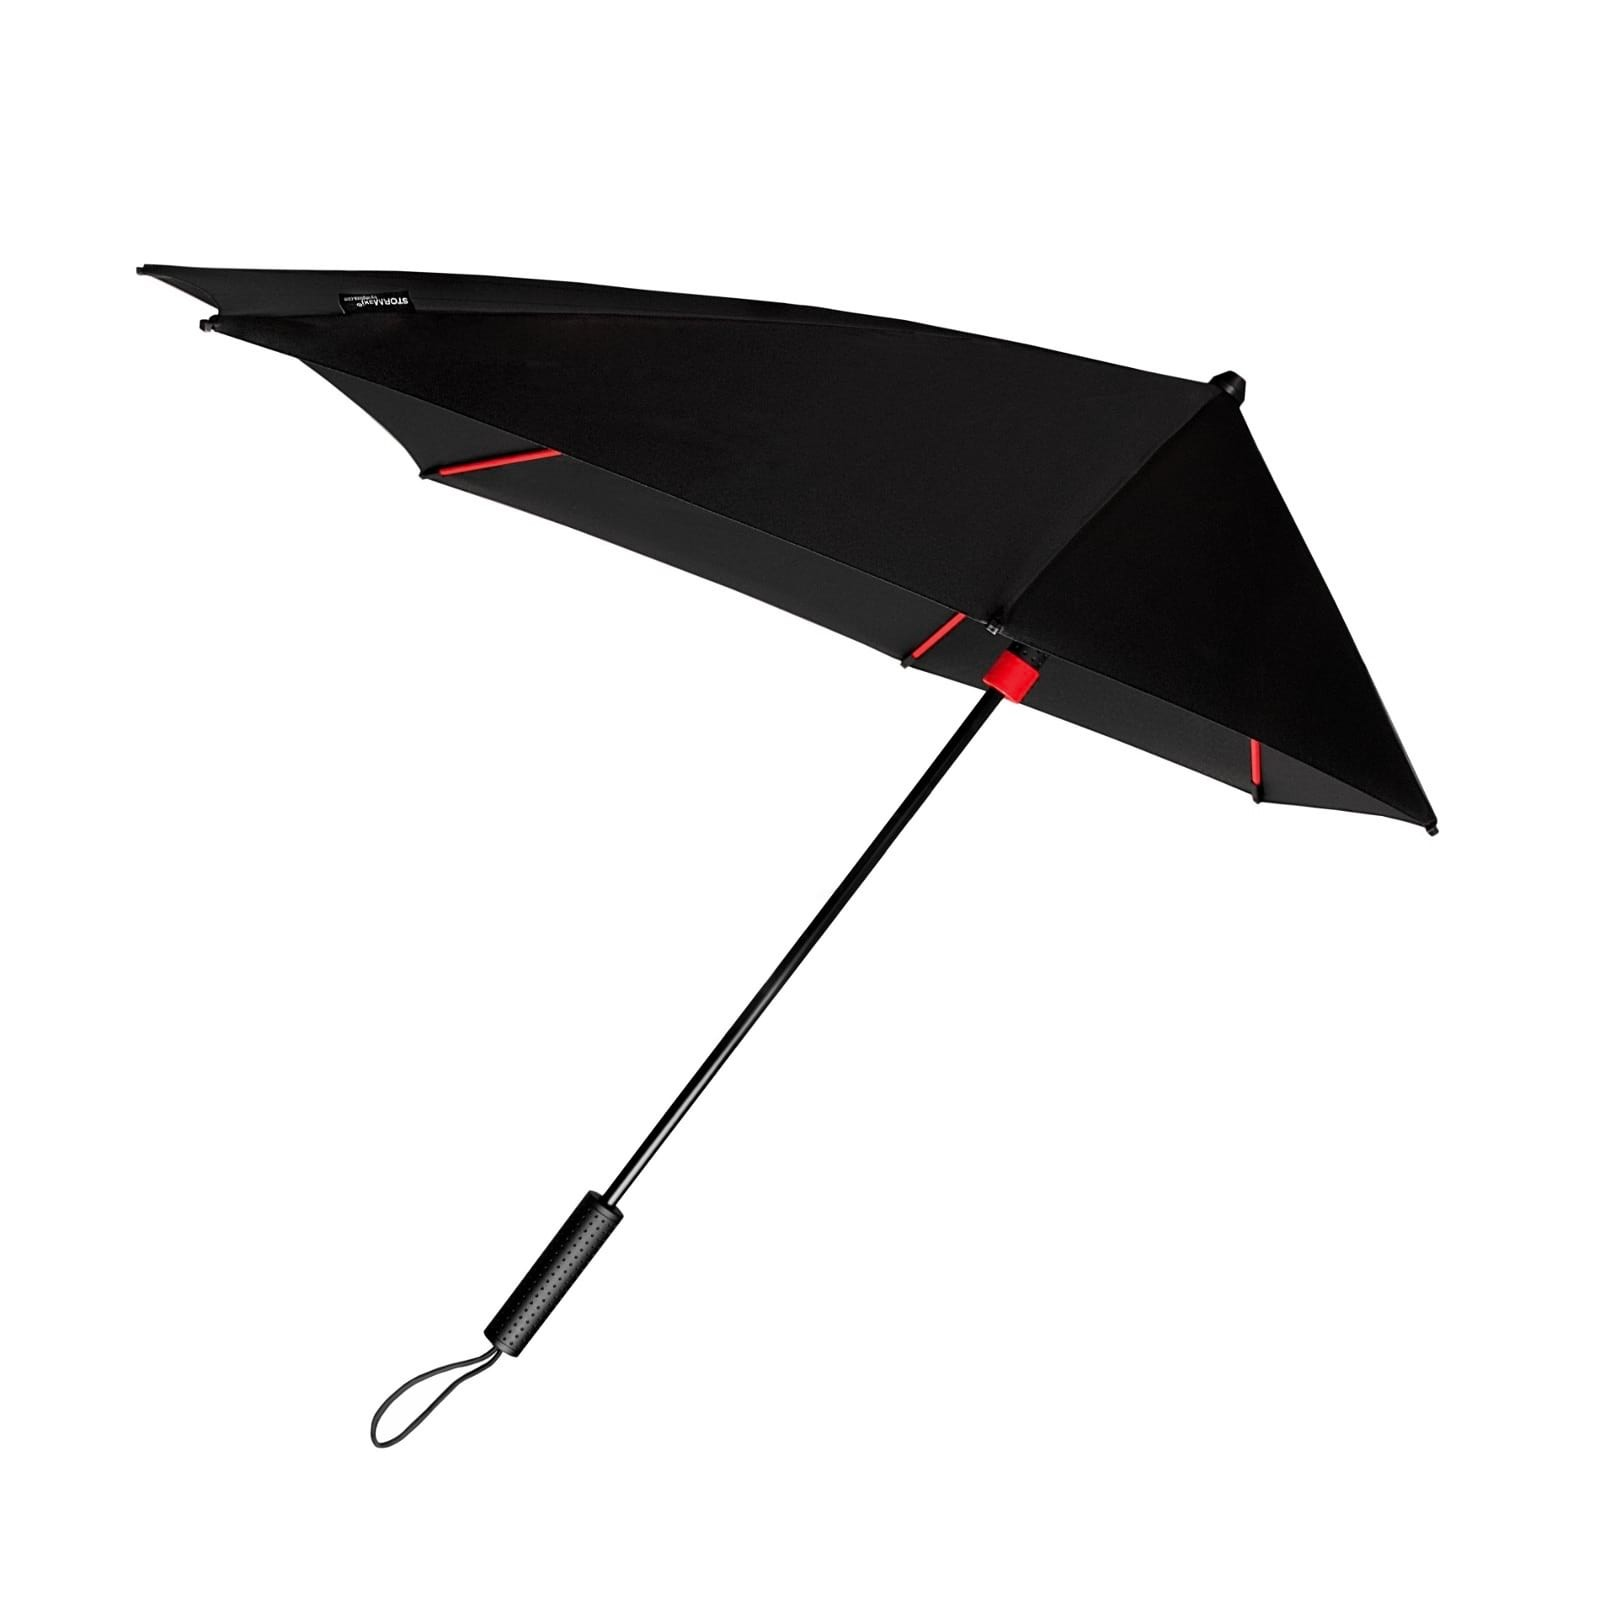 STORMaxi® Storm Umbrella Special Edition Black + Red Frame - Impliva